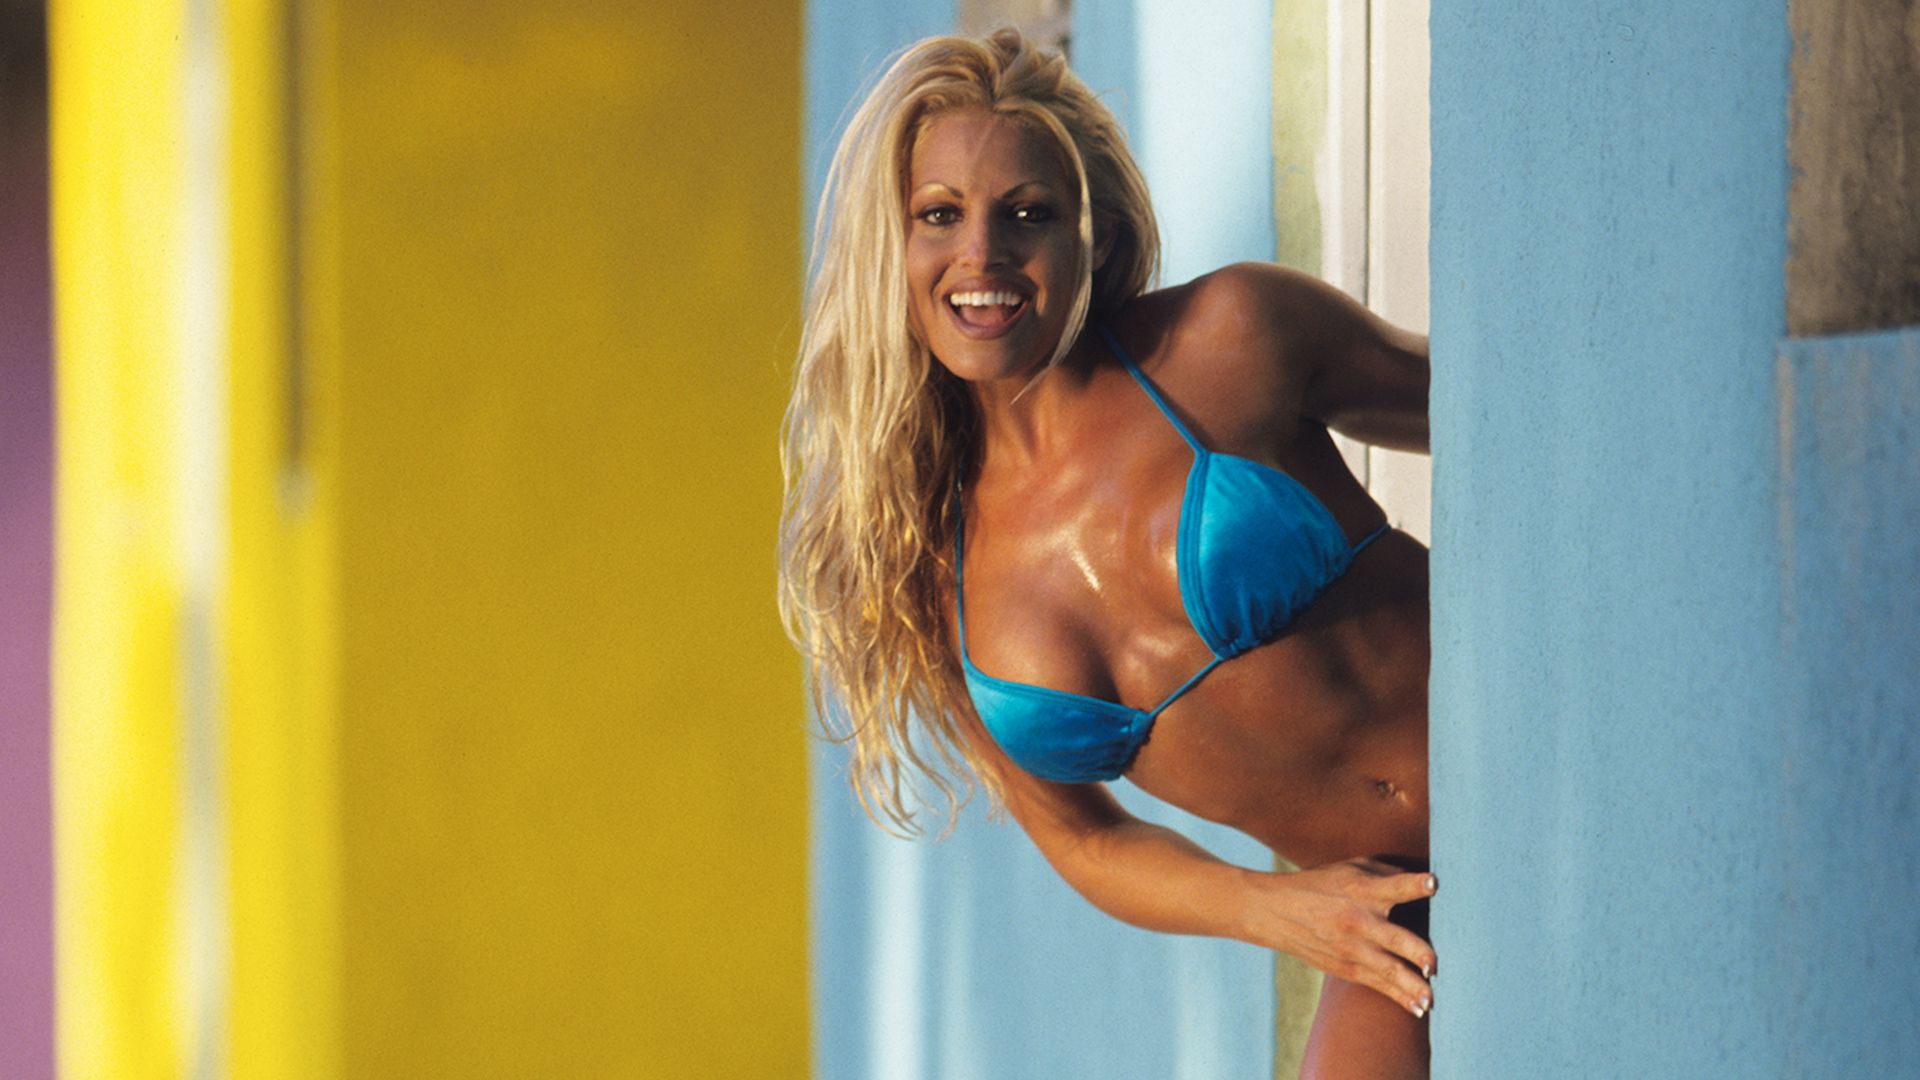 WWE #033 TRISH STRATUS 4x6 8x10 Photo Select Size